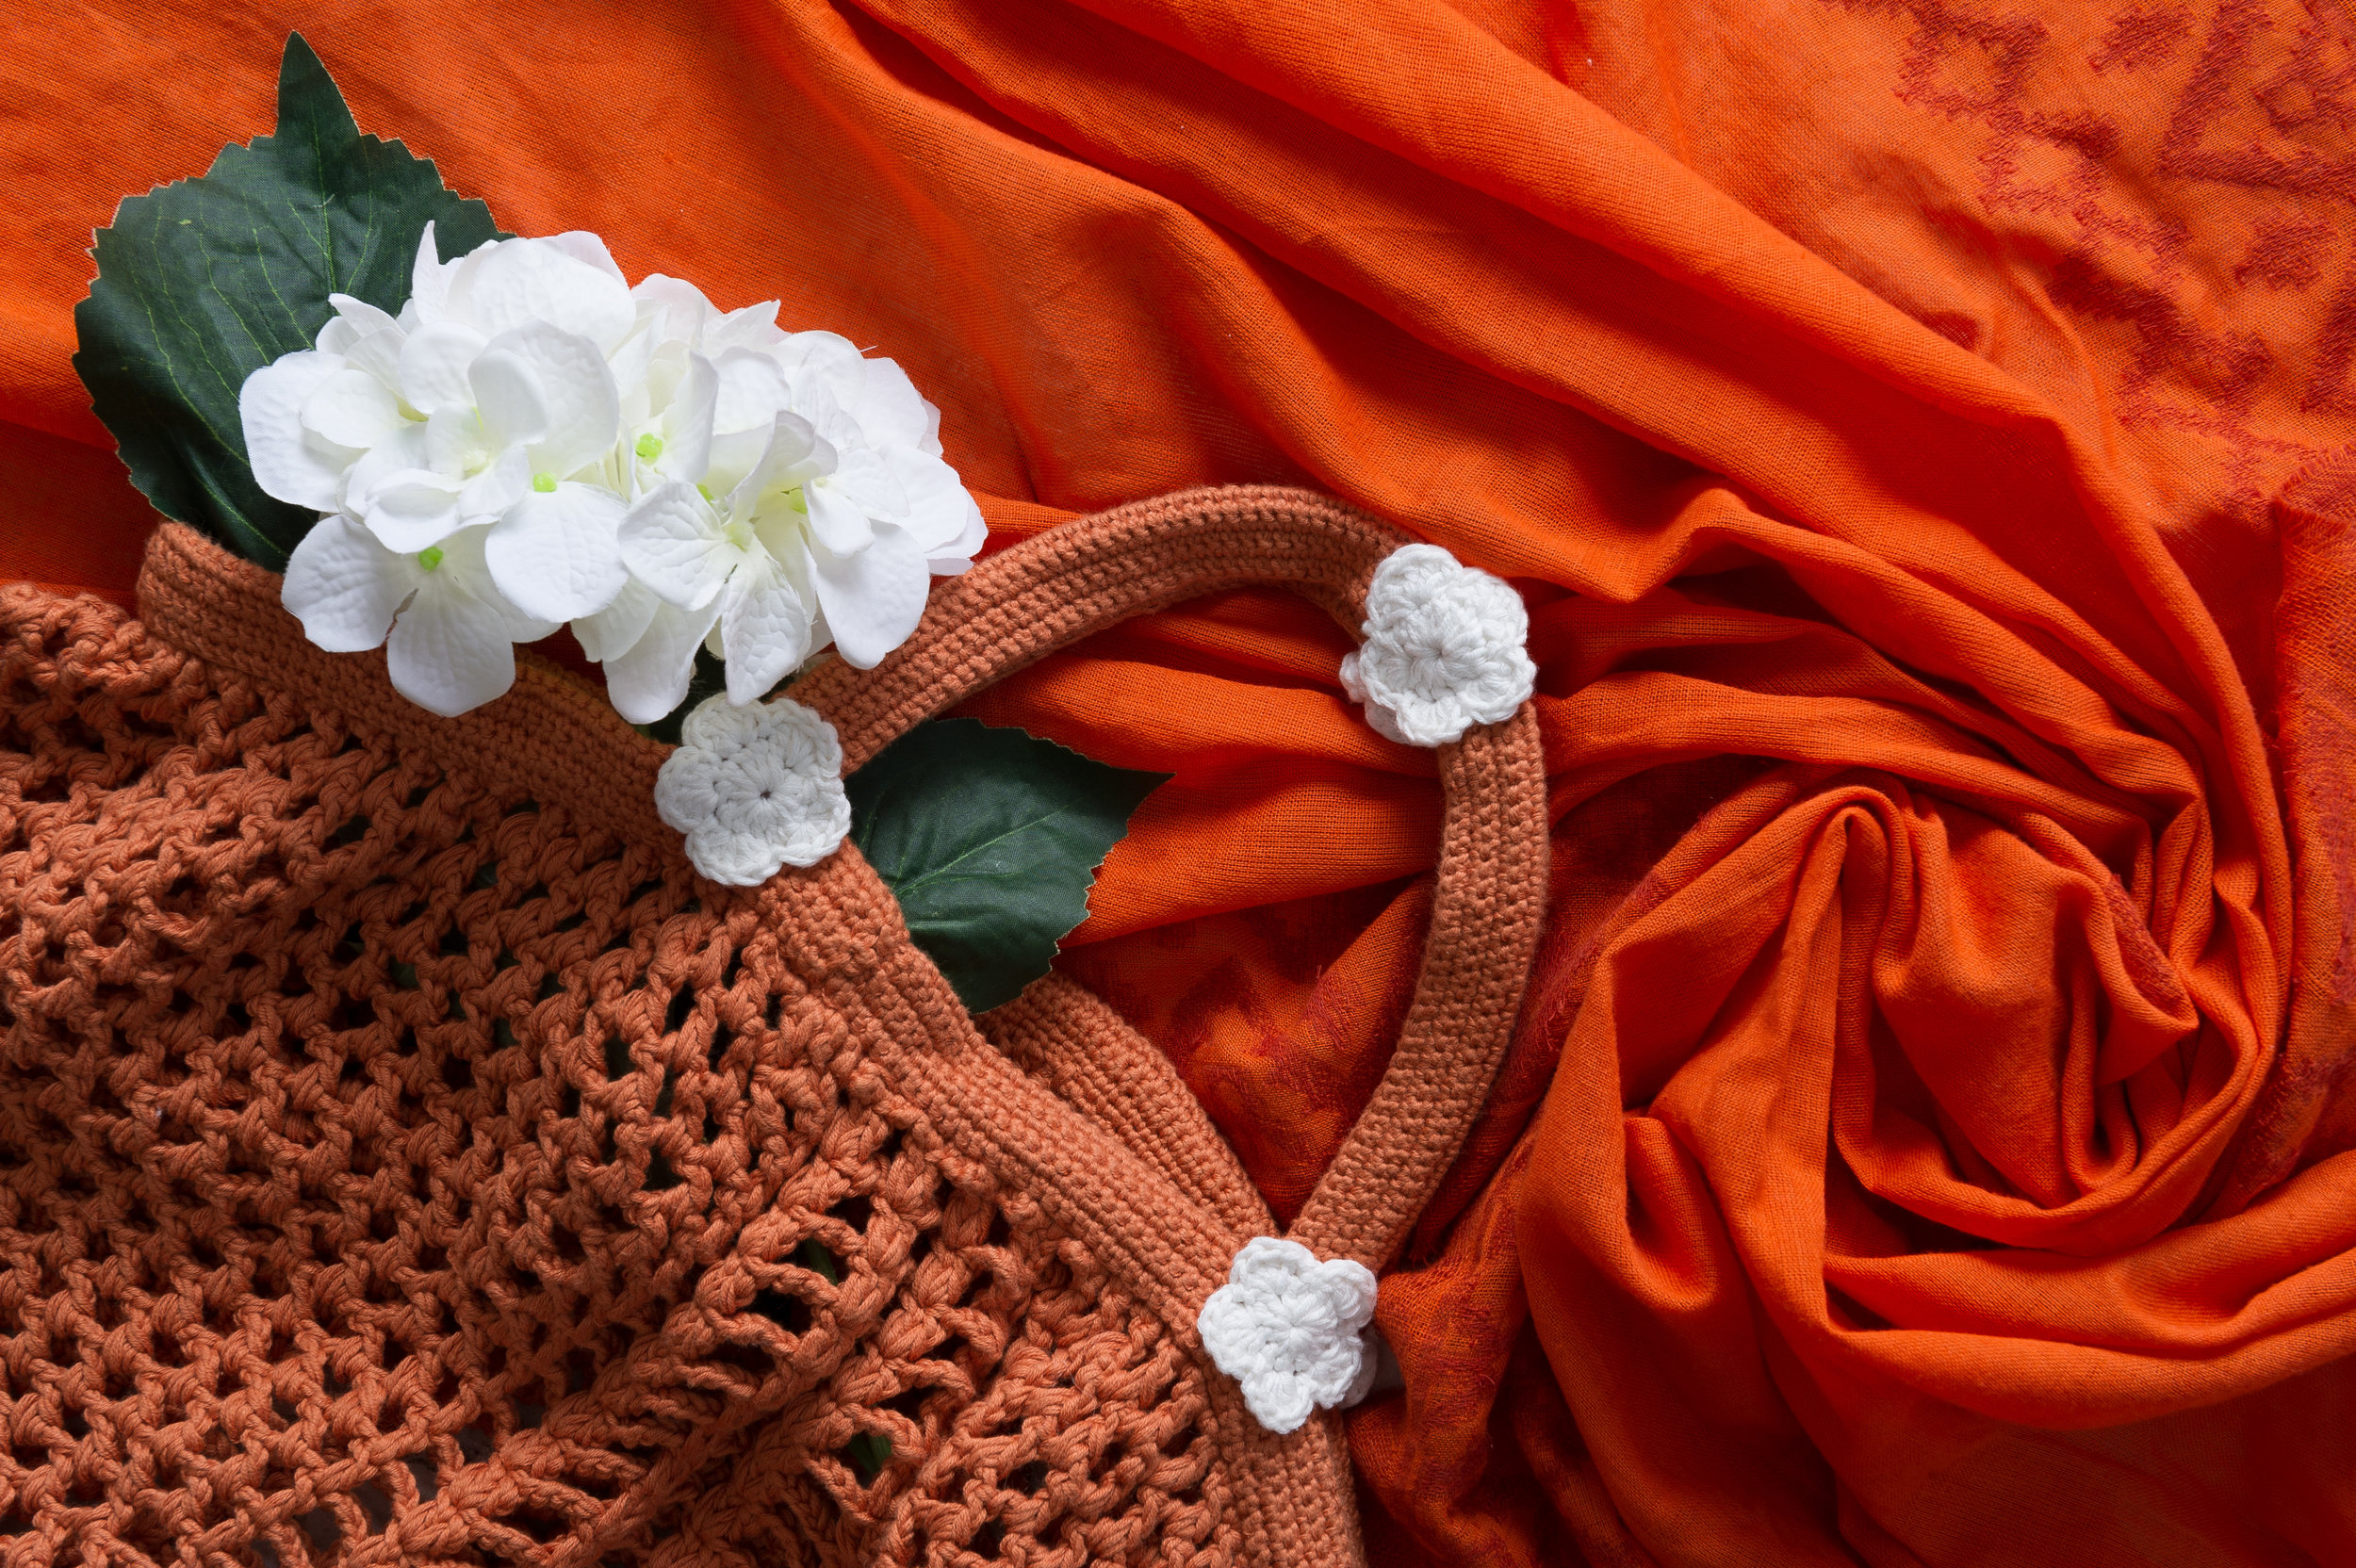 Crocheted Haight Ashbury Farmers Tote in Sienna